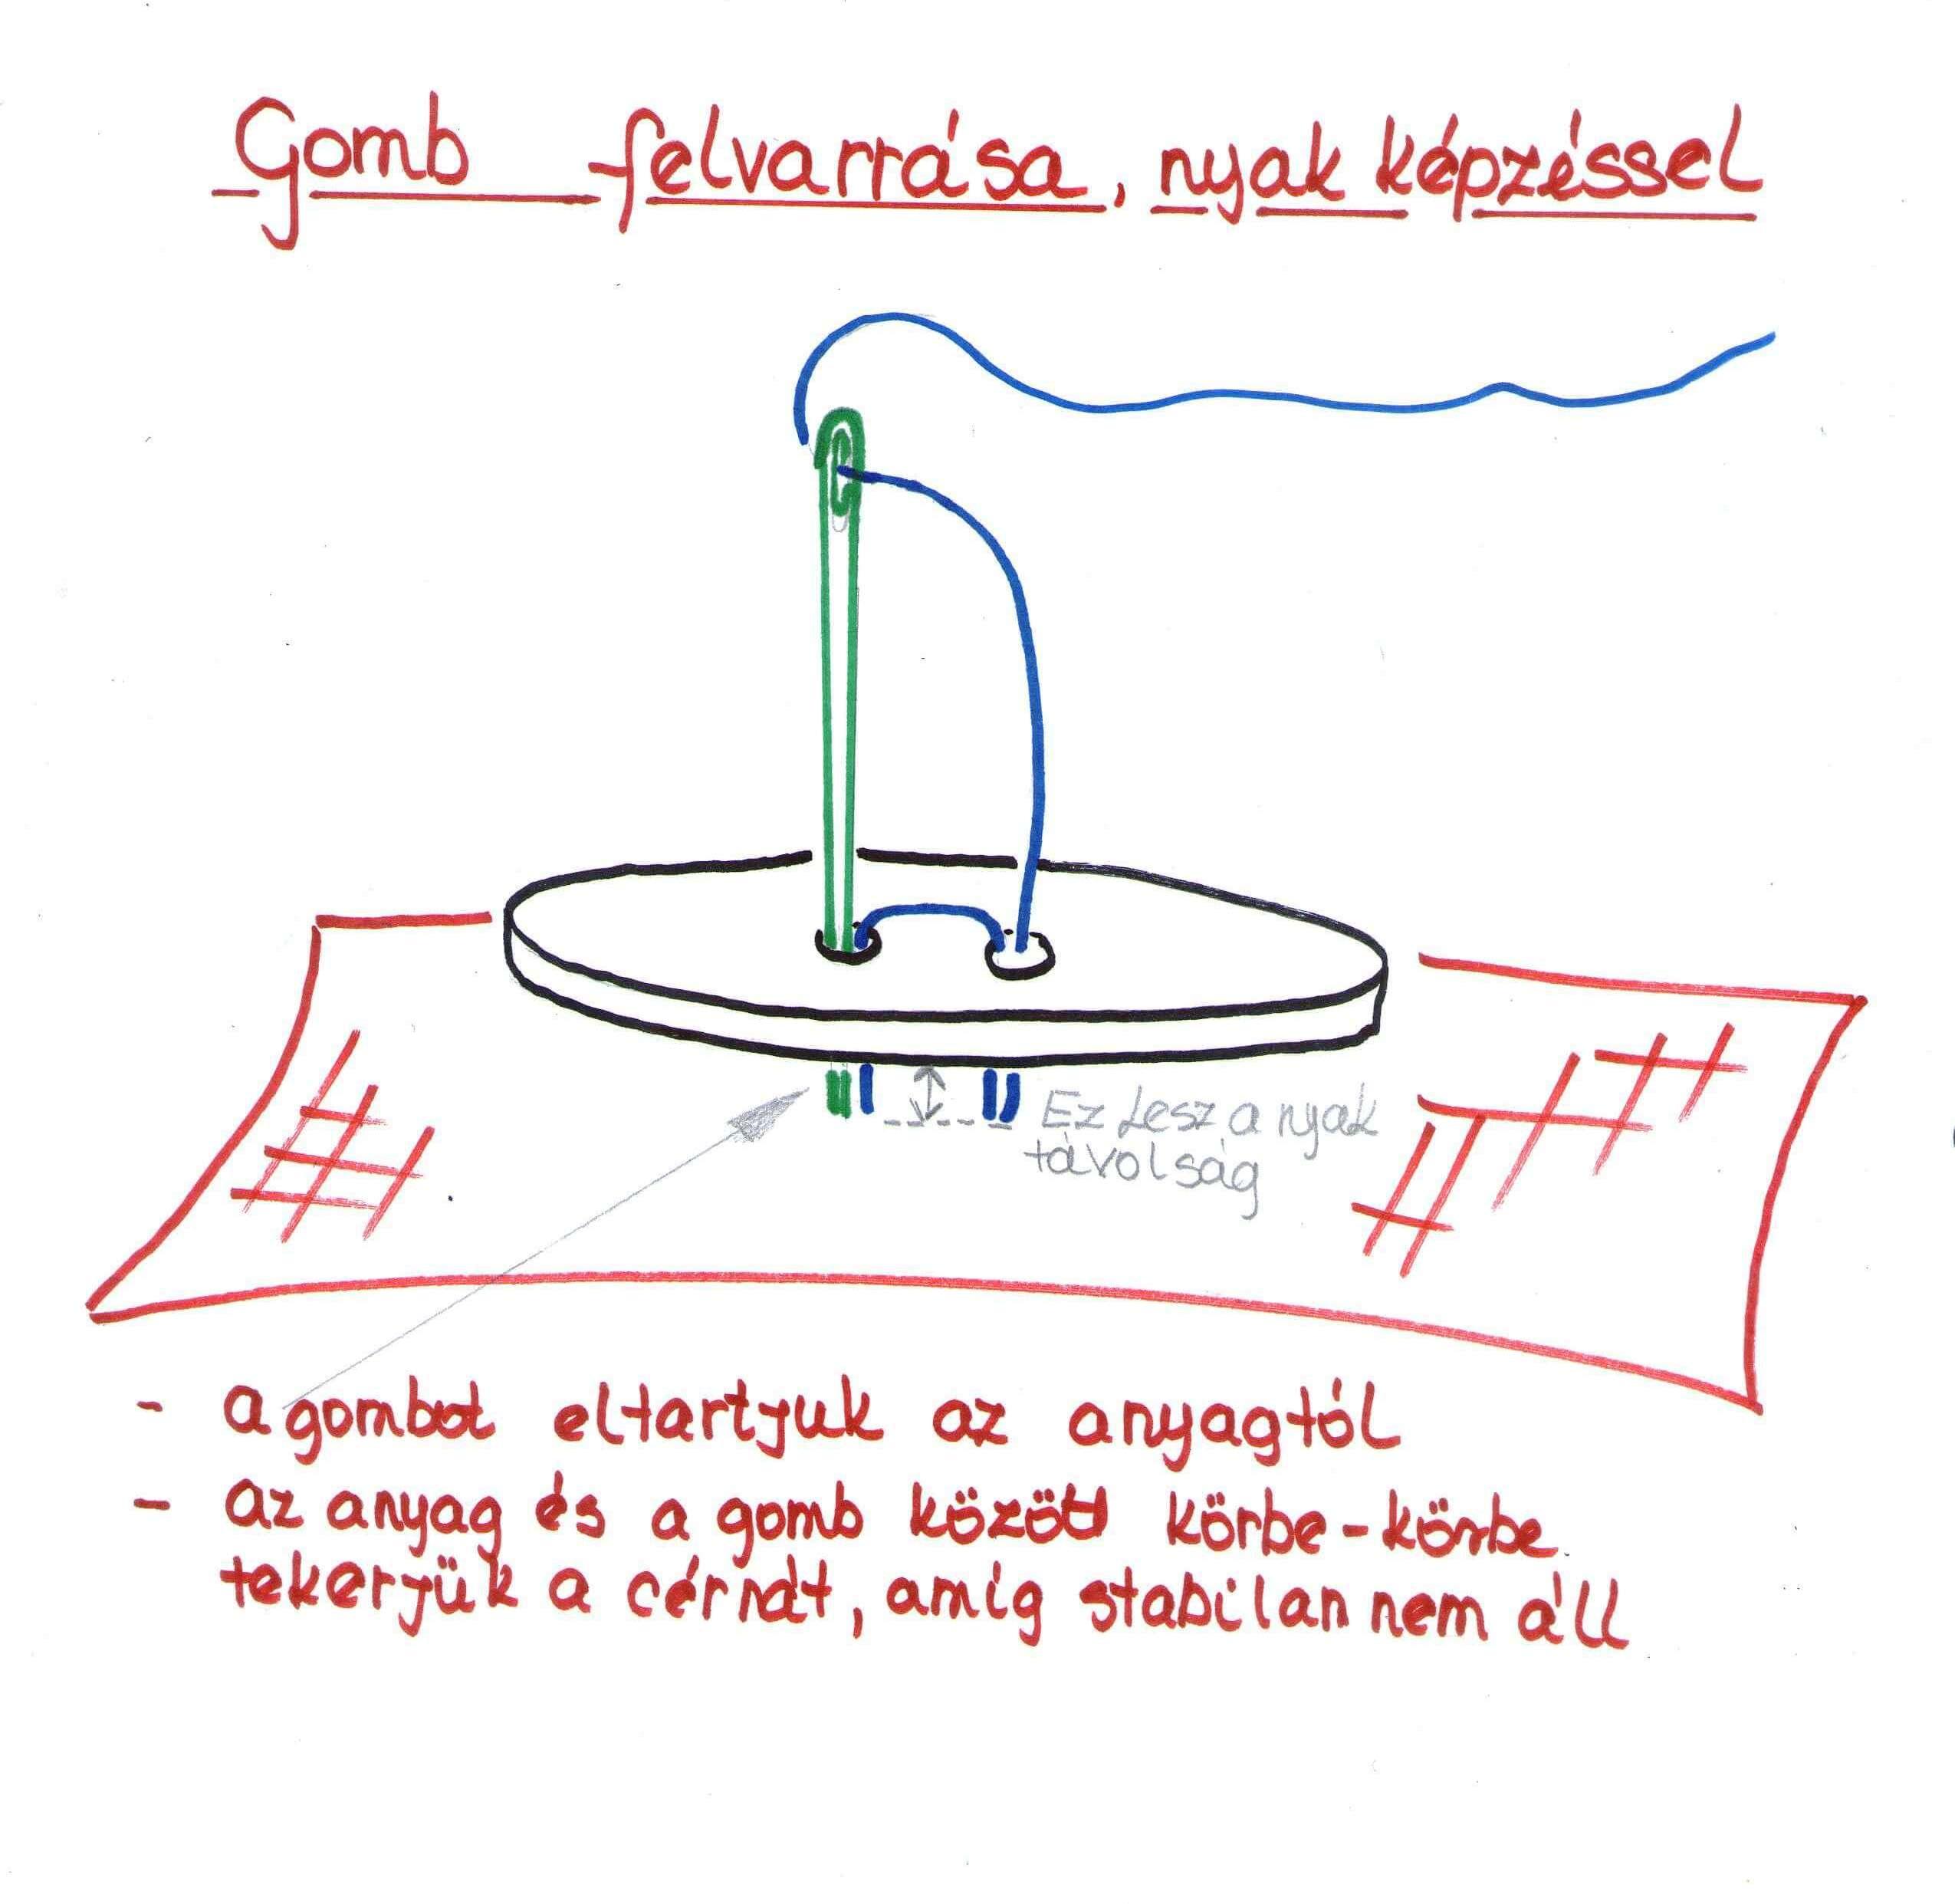 gomb-felvarras